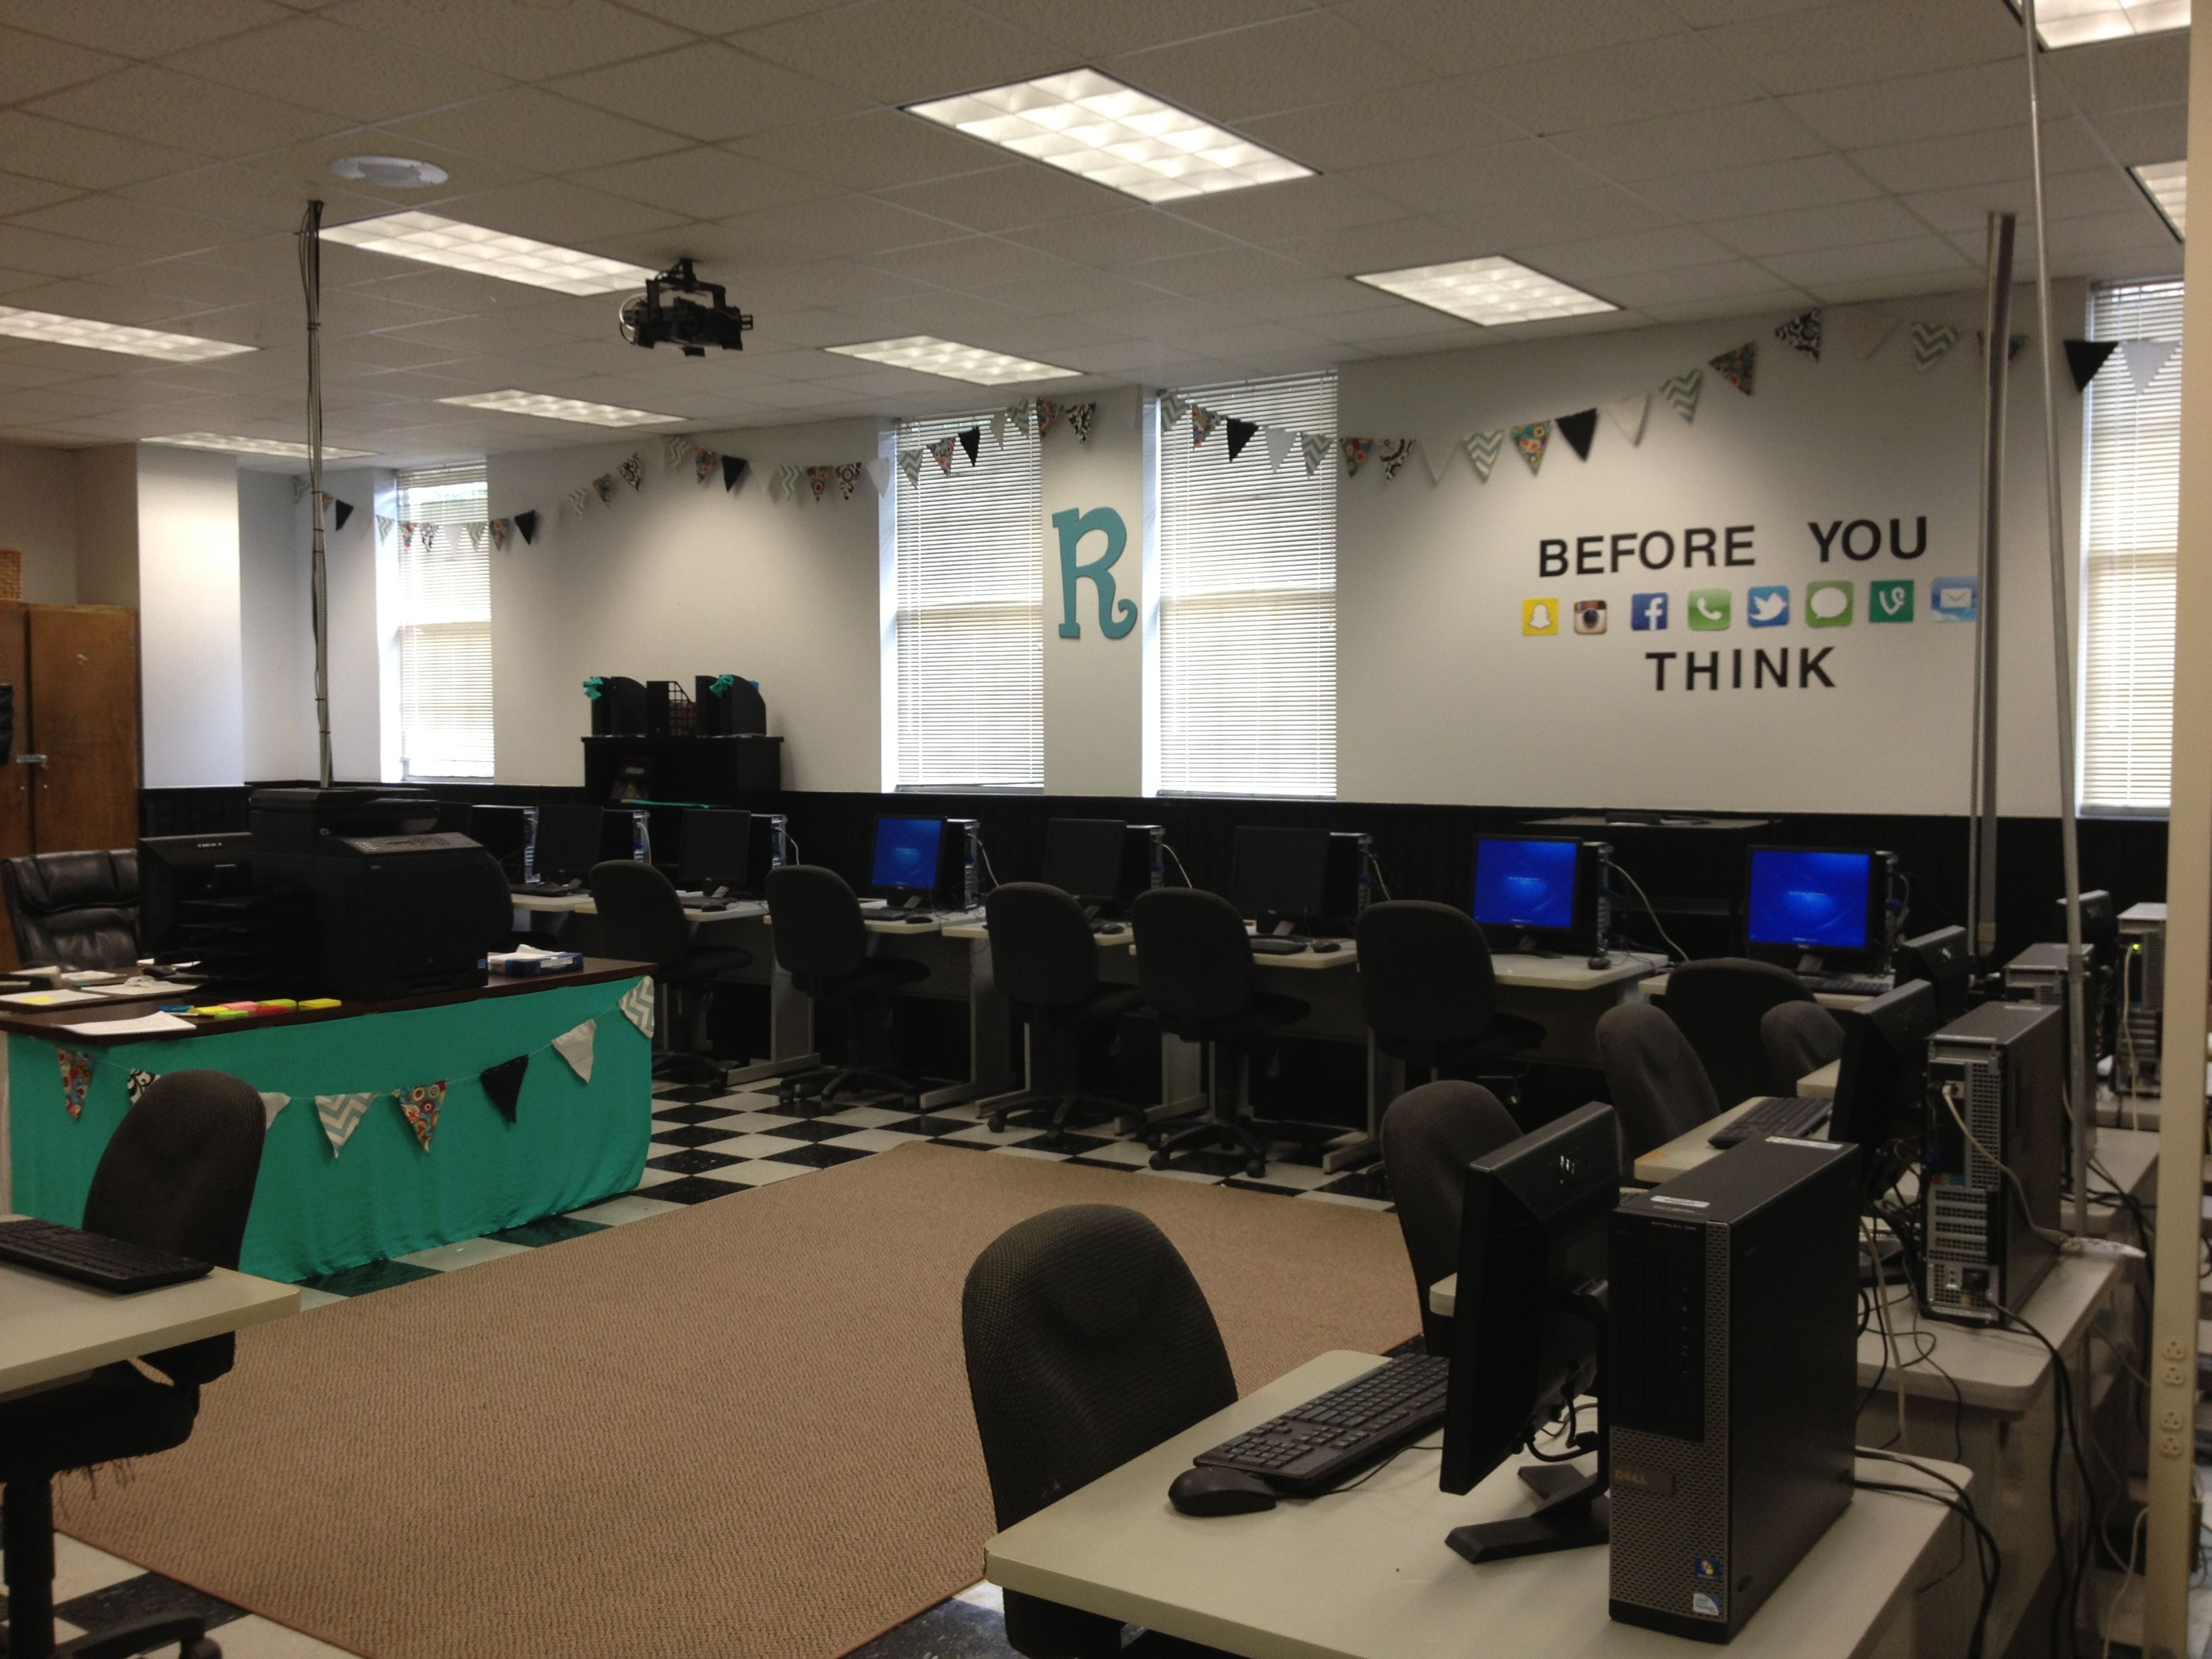 My High School Computer Lab Classroom